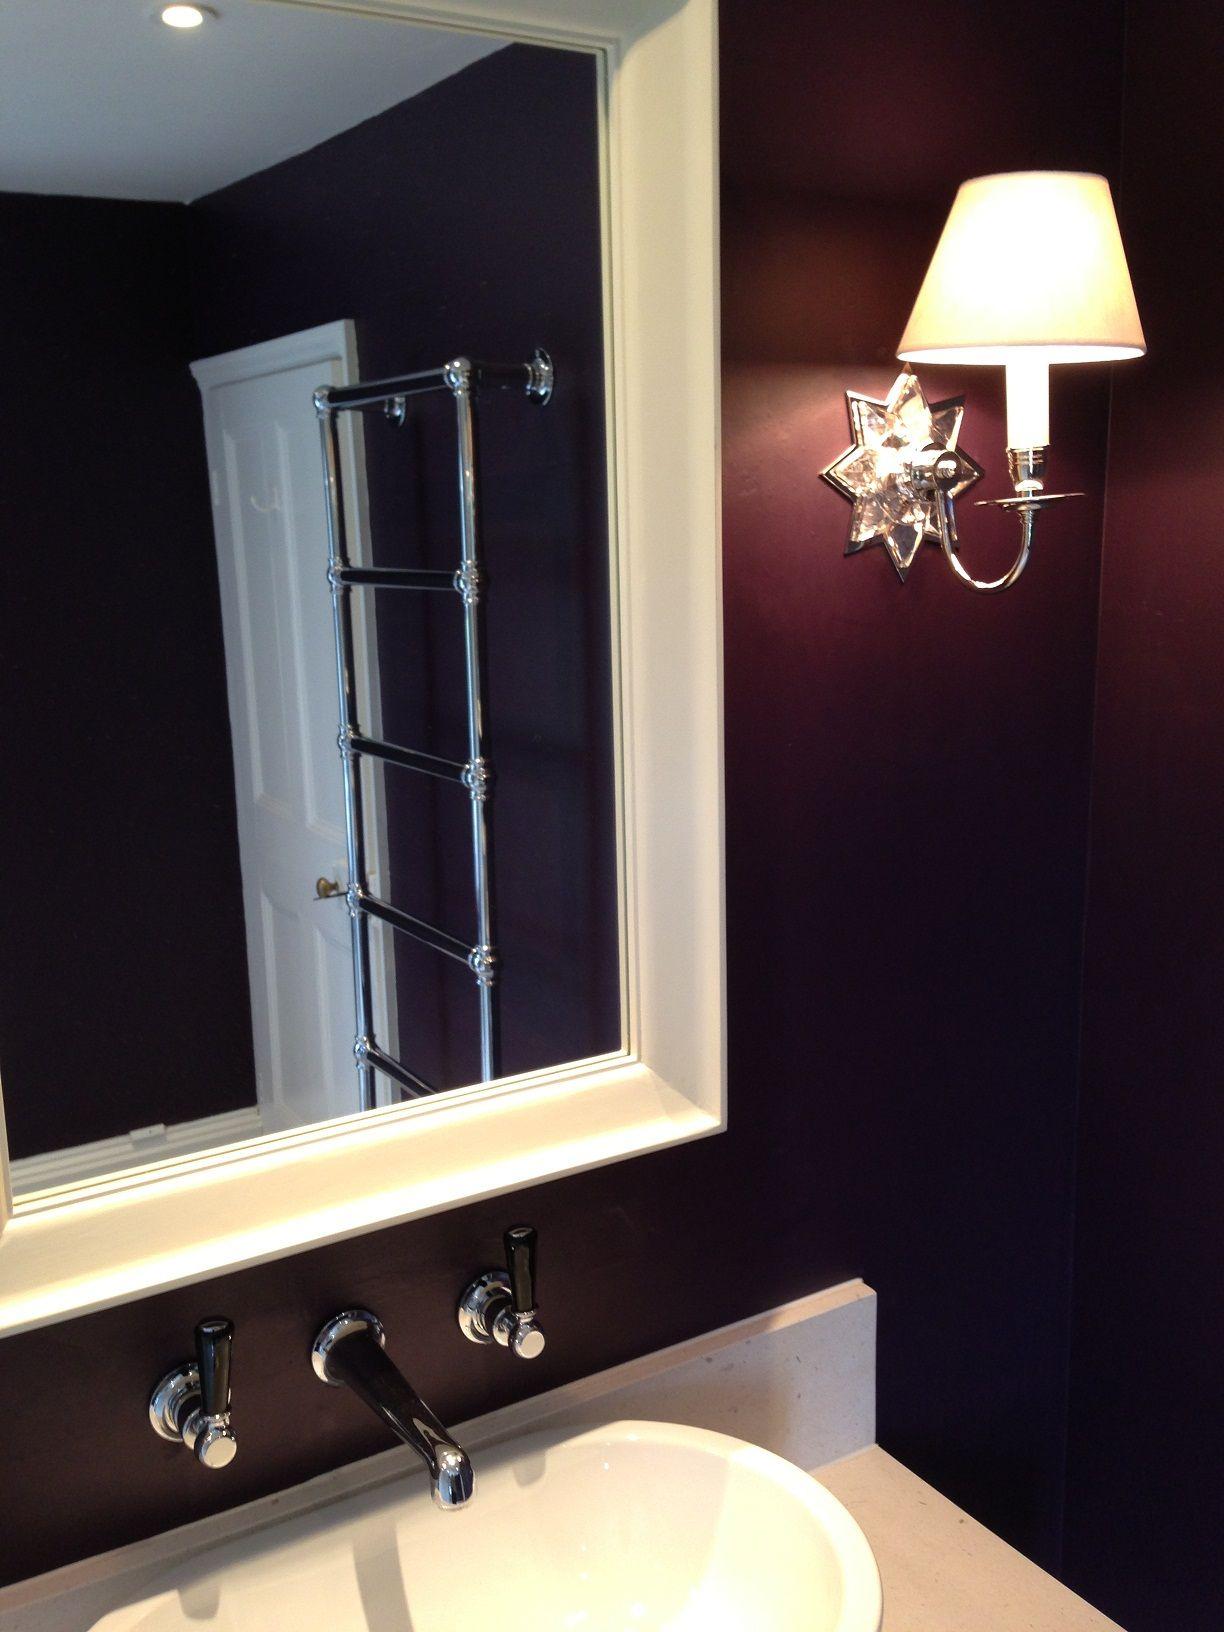 Bathroom Mirrors Vaughan mirror with hidden medicine cabinet behind. vaughan 'polaris